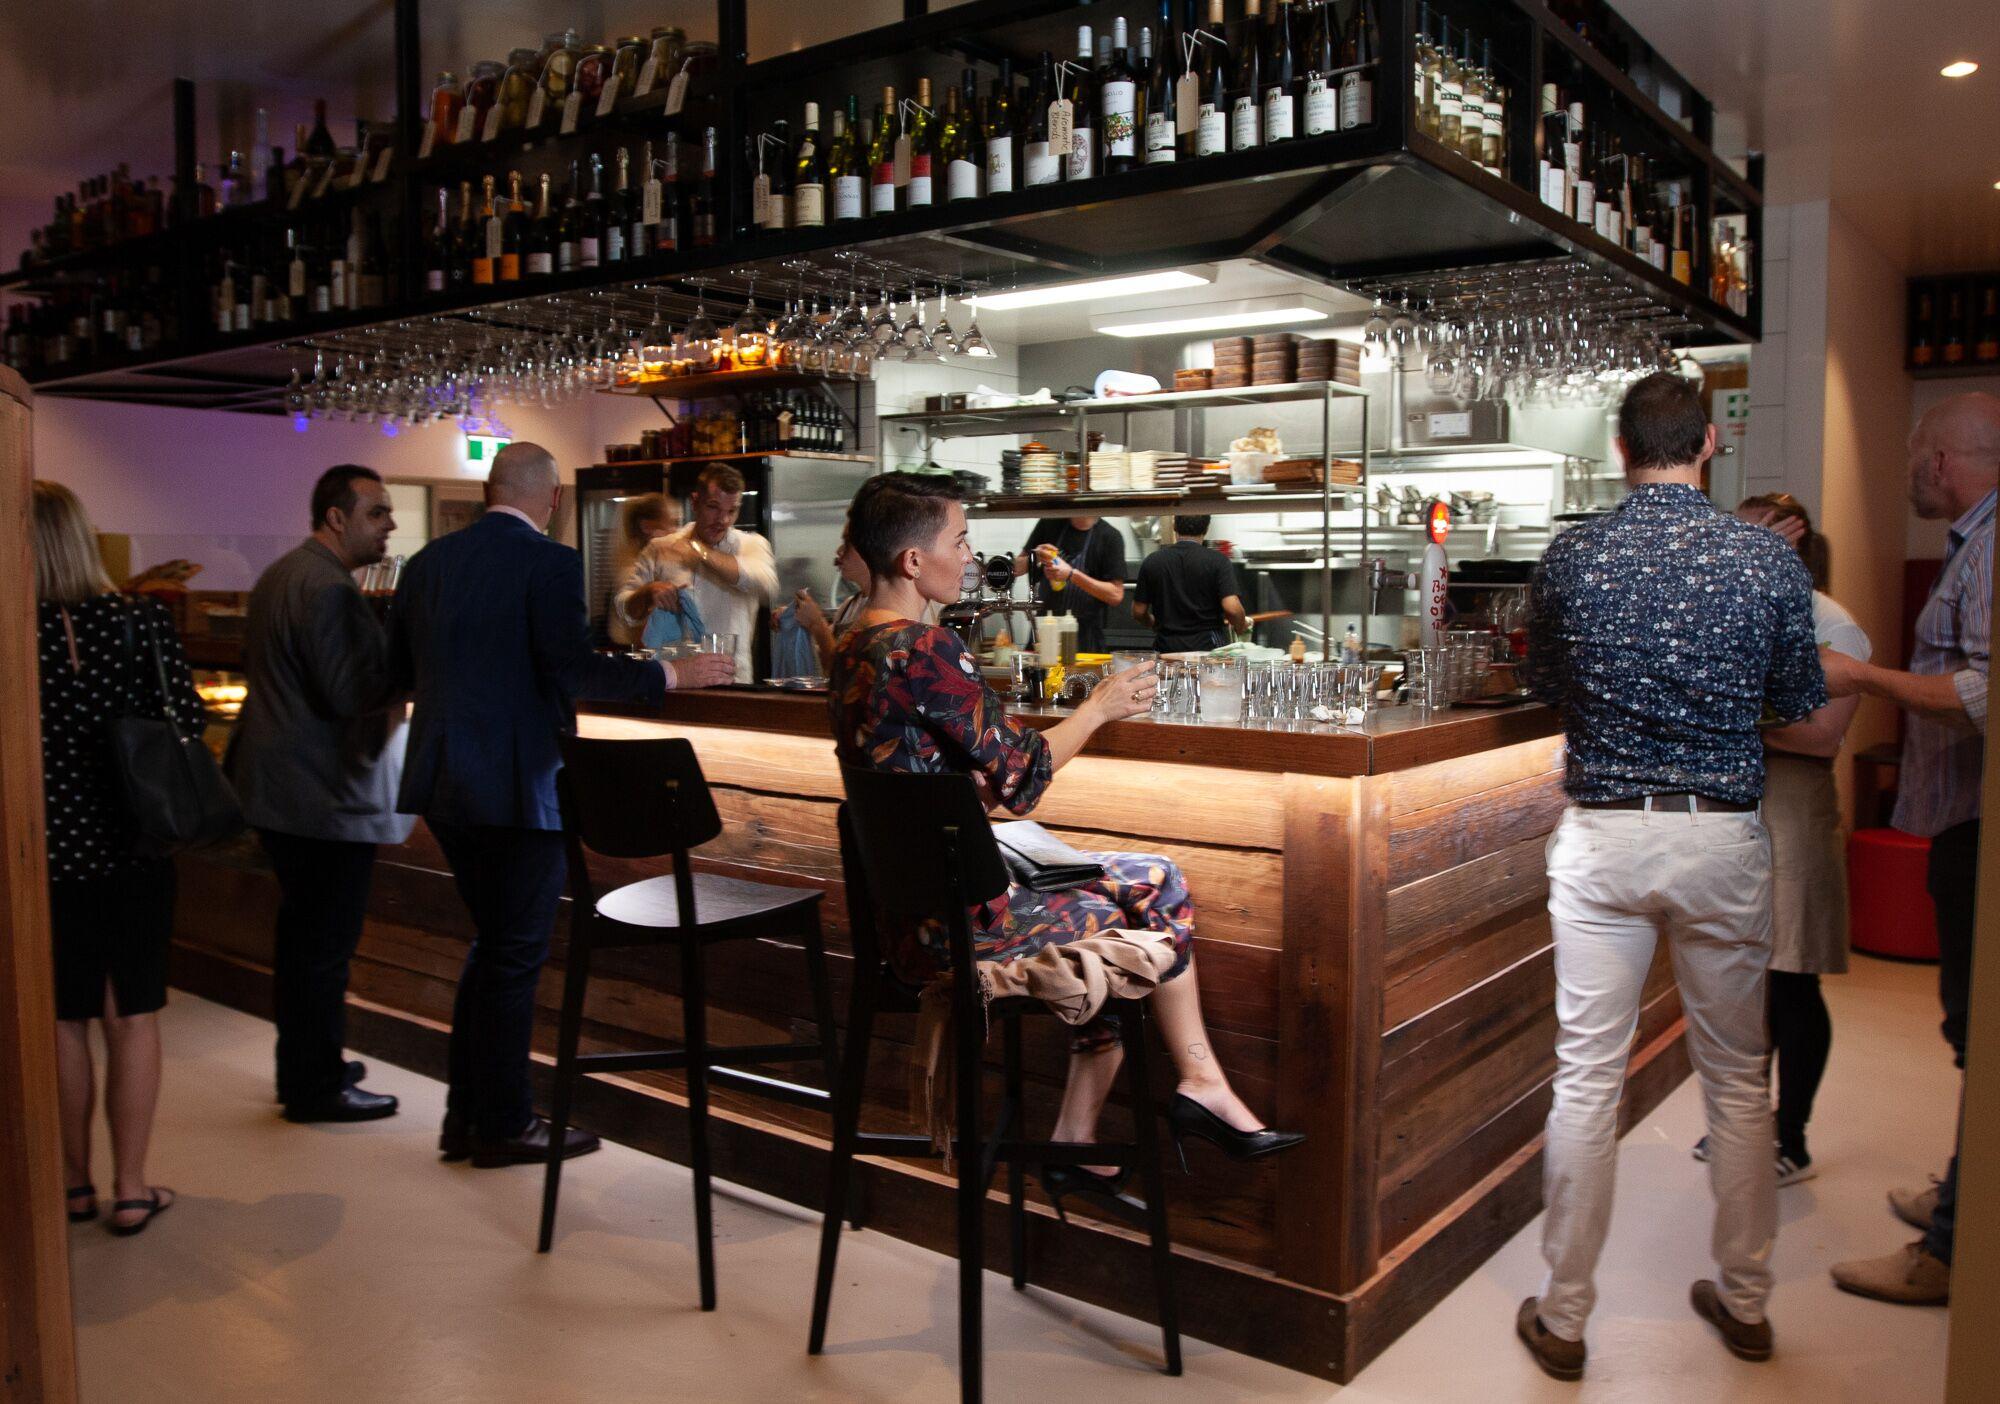 el matador brisbane interior bar alcohol spanish wine beer tapas